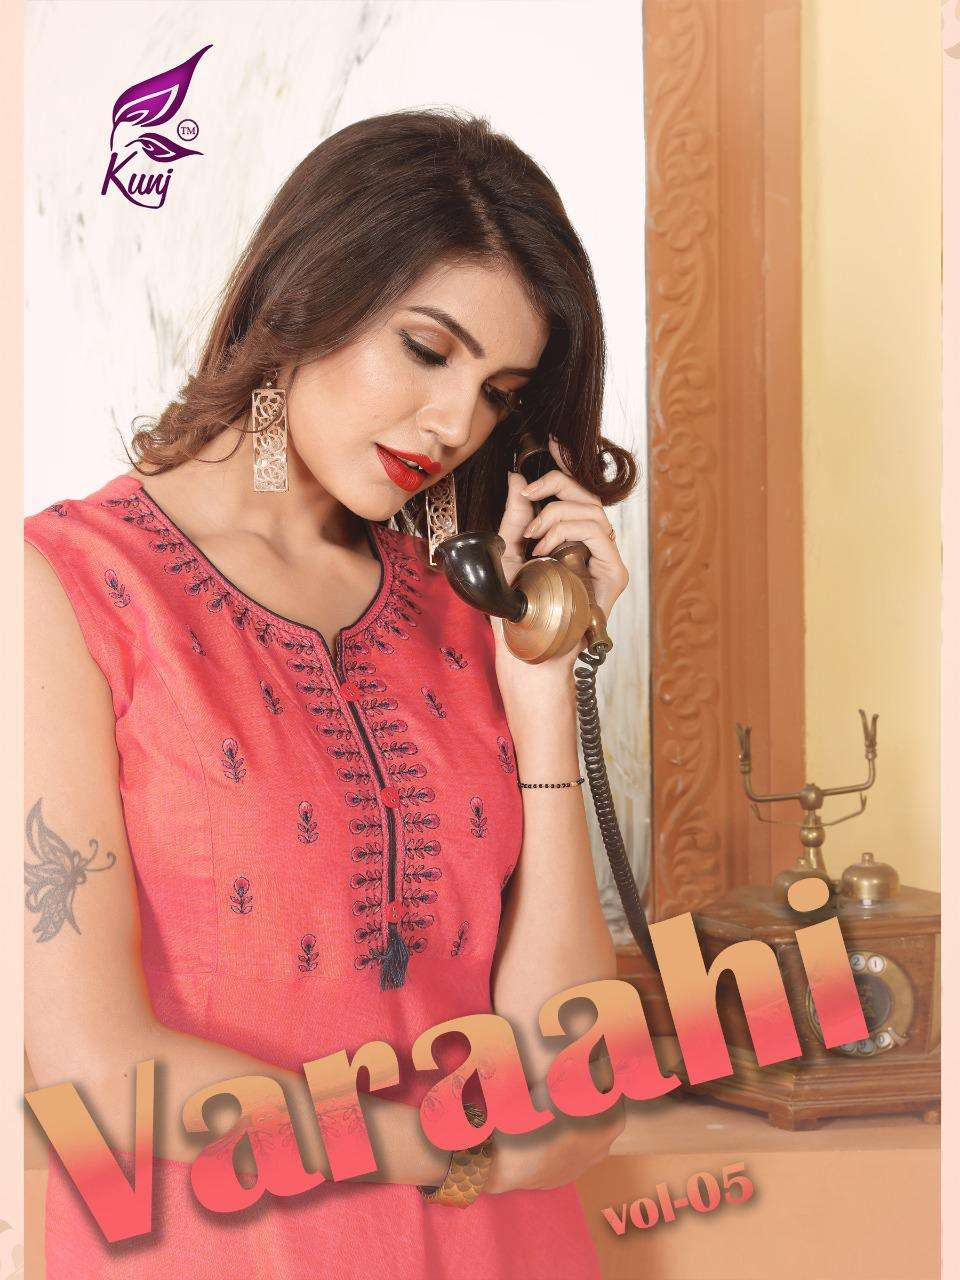 Vaarahi Vol.5 By Kunj Heavy Rayon Two Tone With Work Kurti